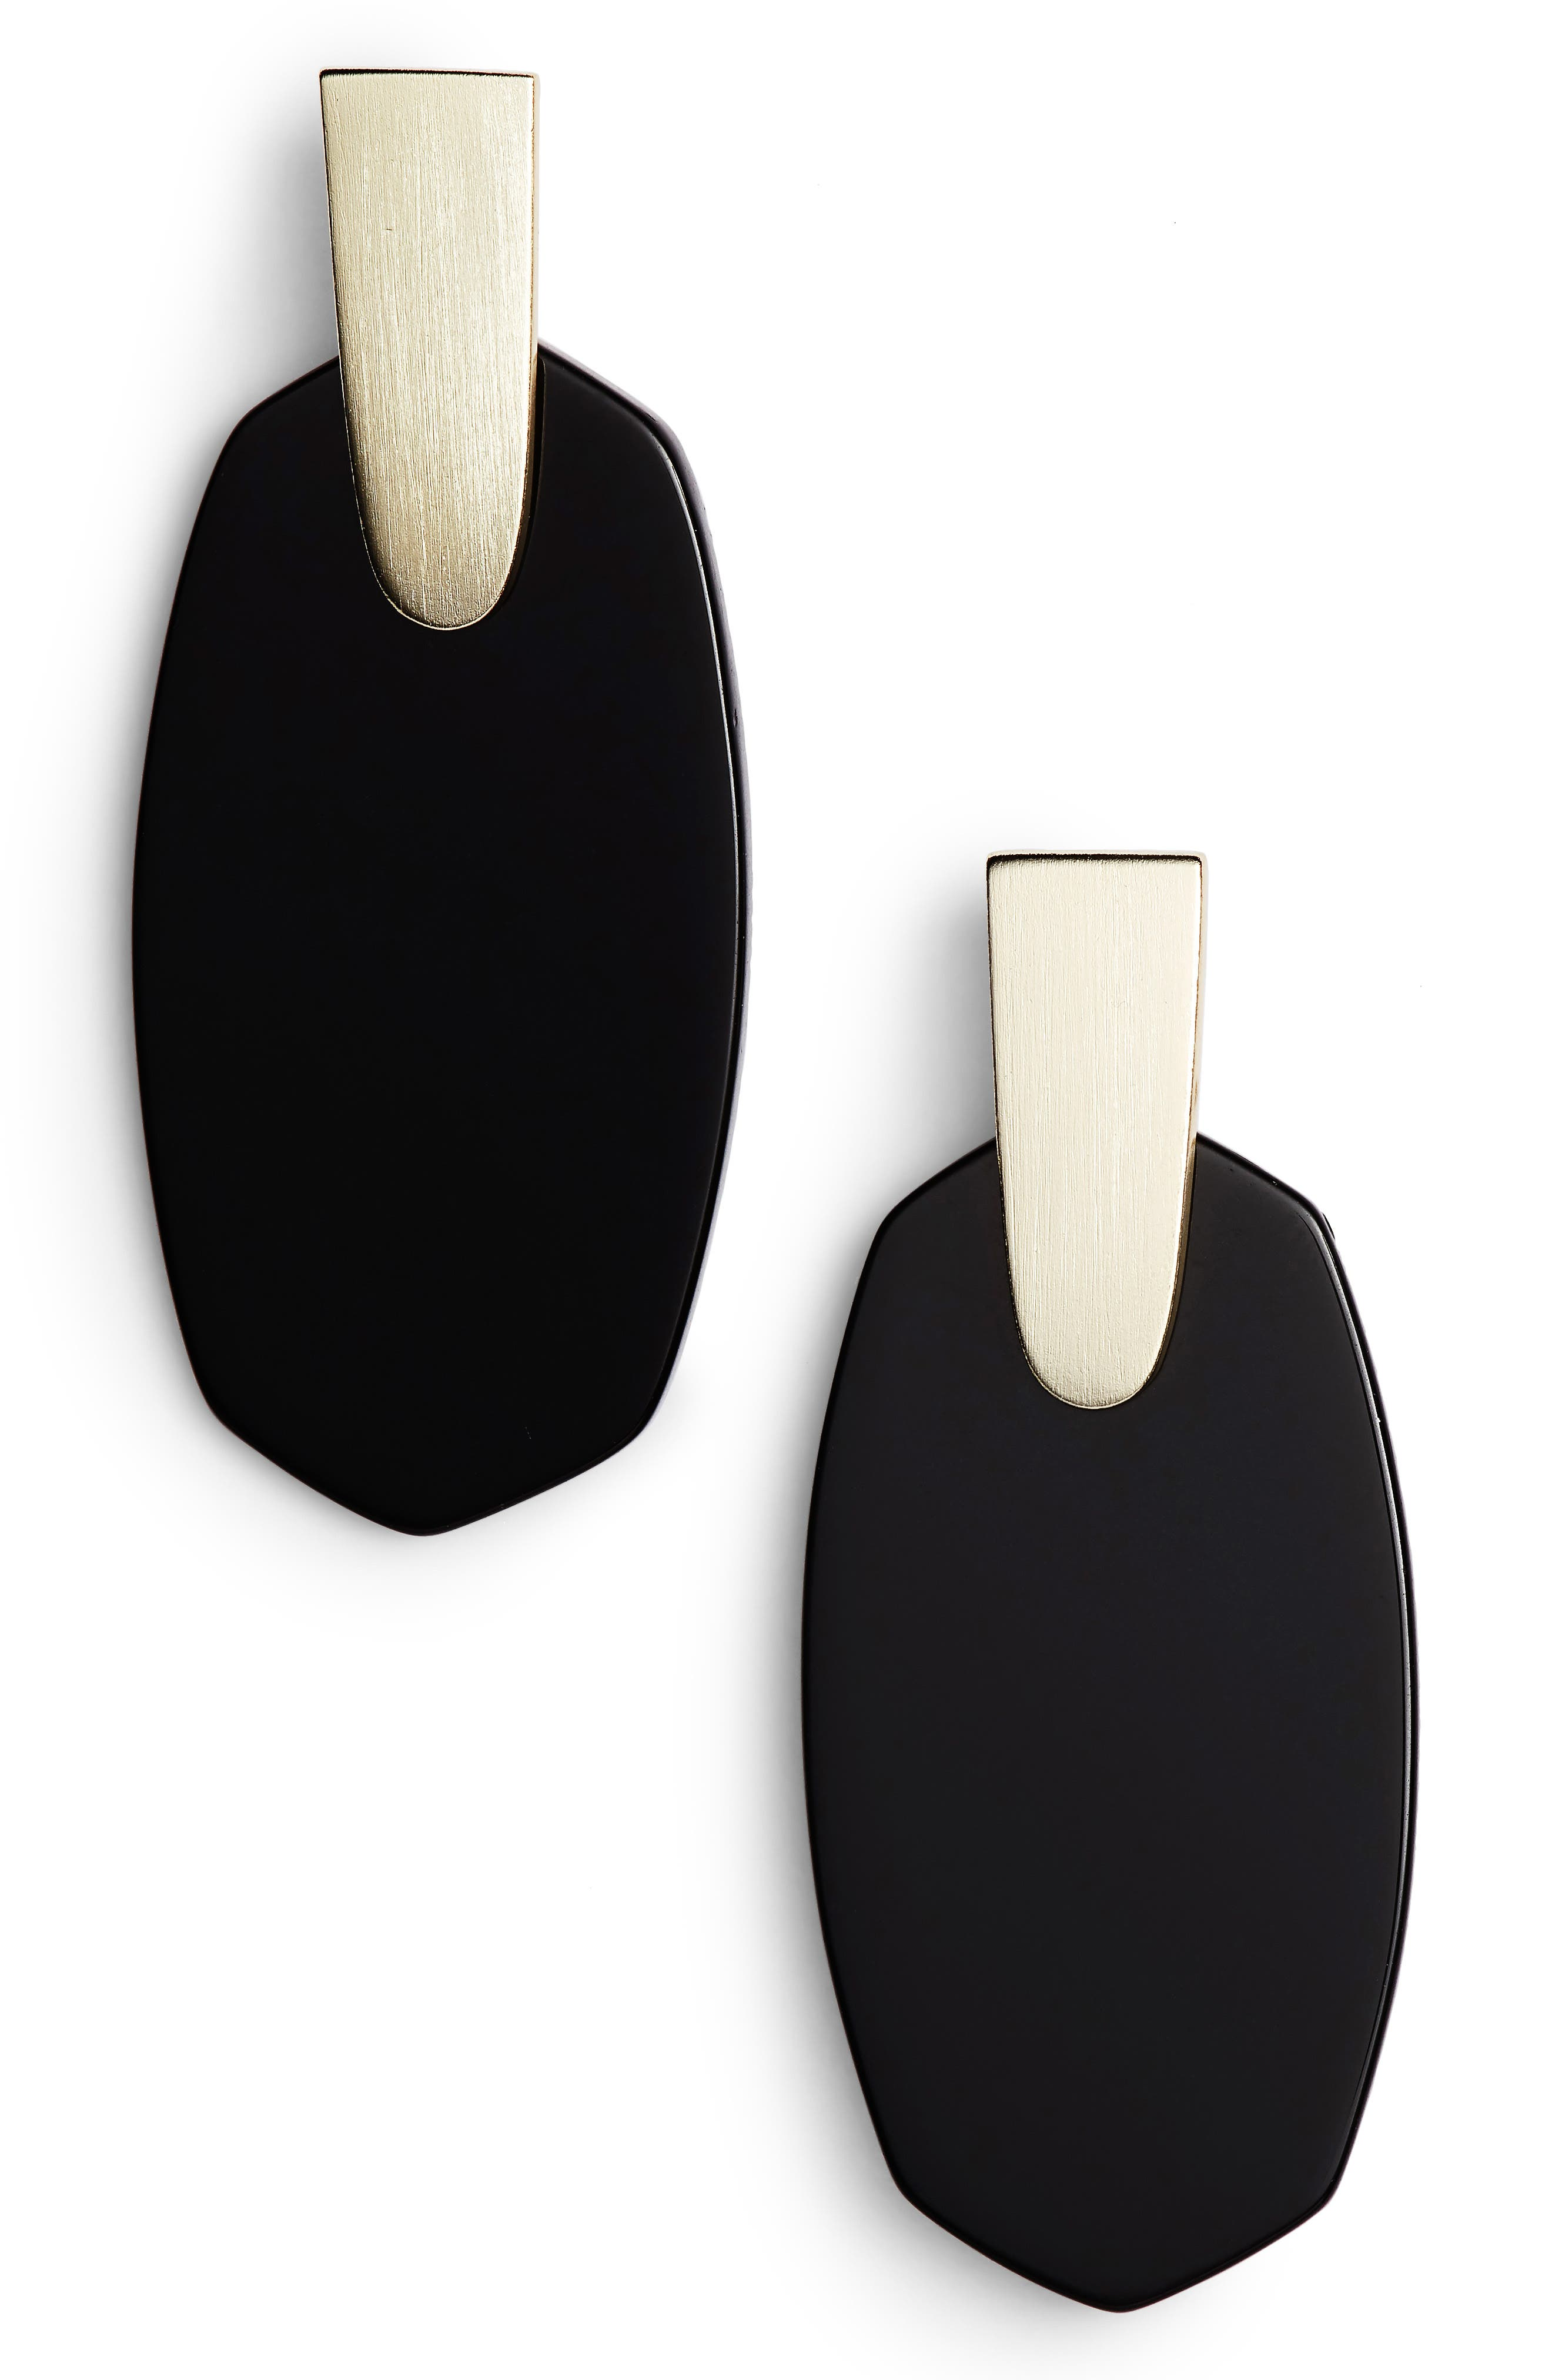 KENDRA SCOTT, Aragon Drop Earrings, Main thumbnail 1, color, BLACK/ GOLD